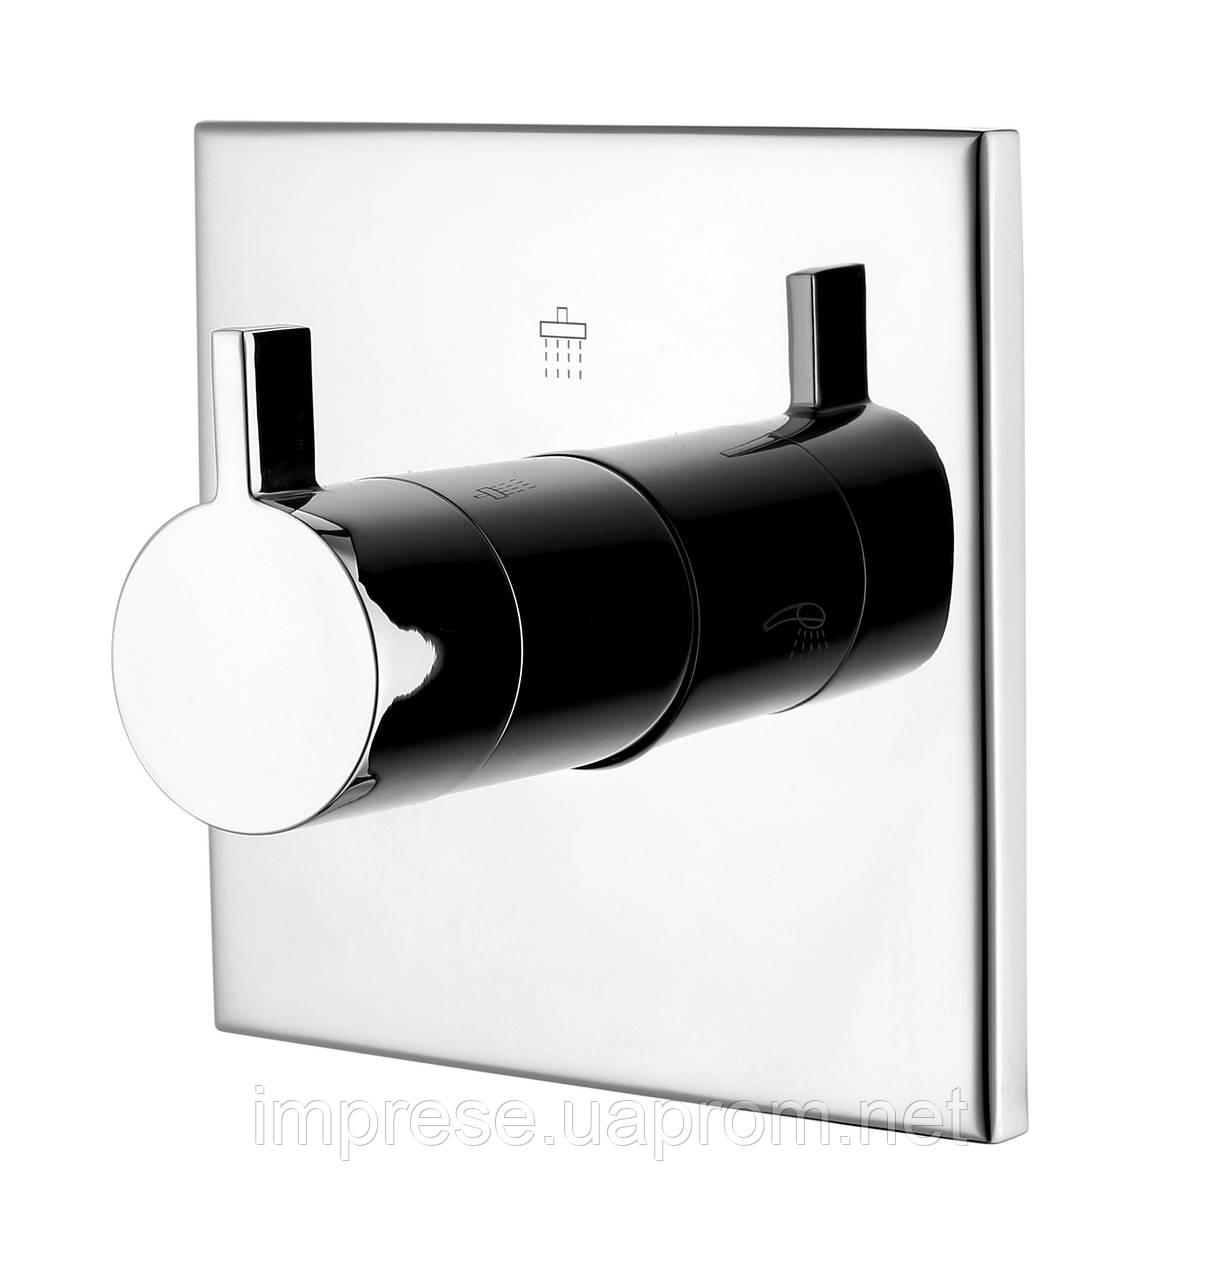 Запорный / переключающий вентиль Zamek VR-151032